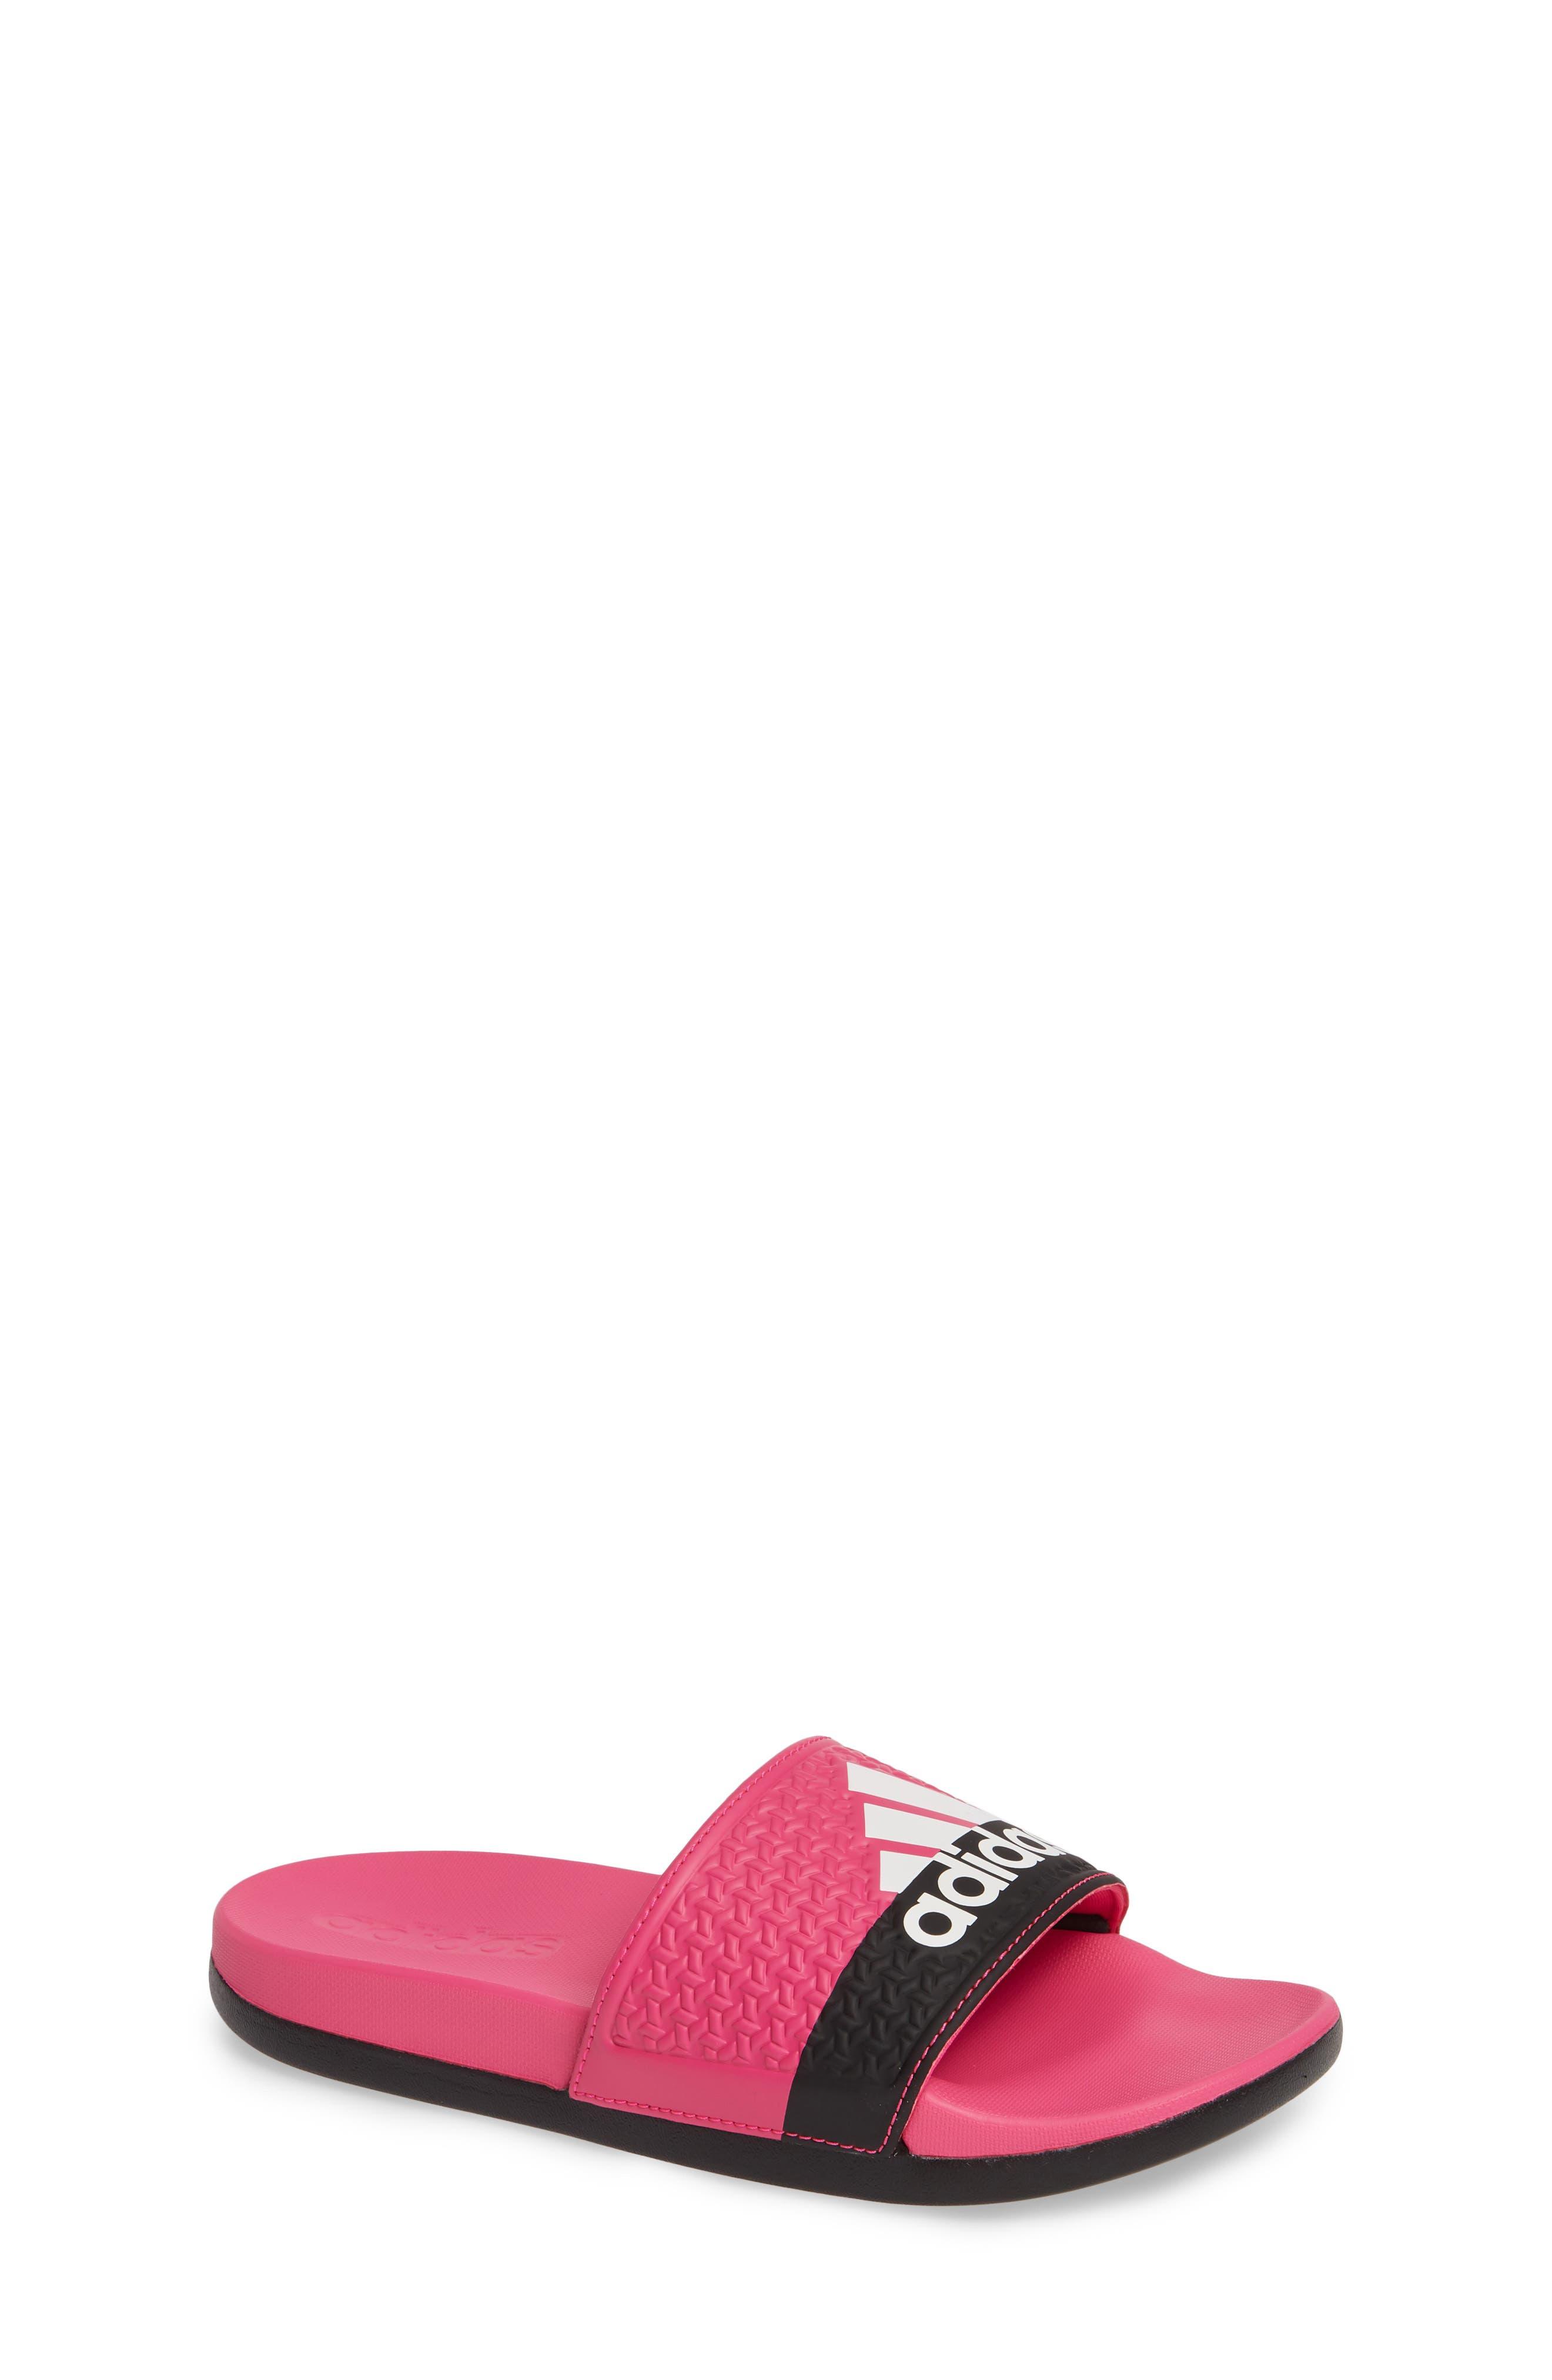 266e8a044dd adidas sandals | Nordstrom